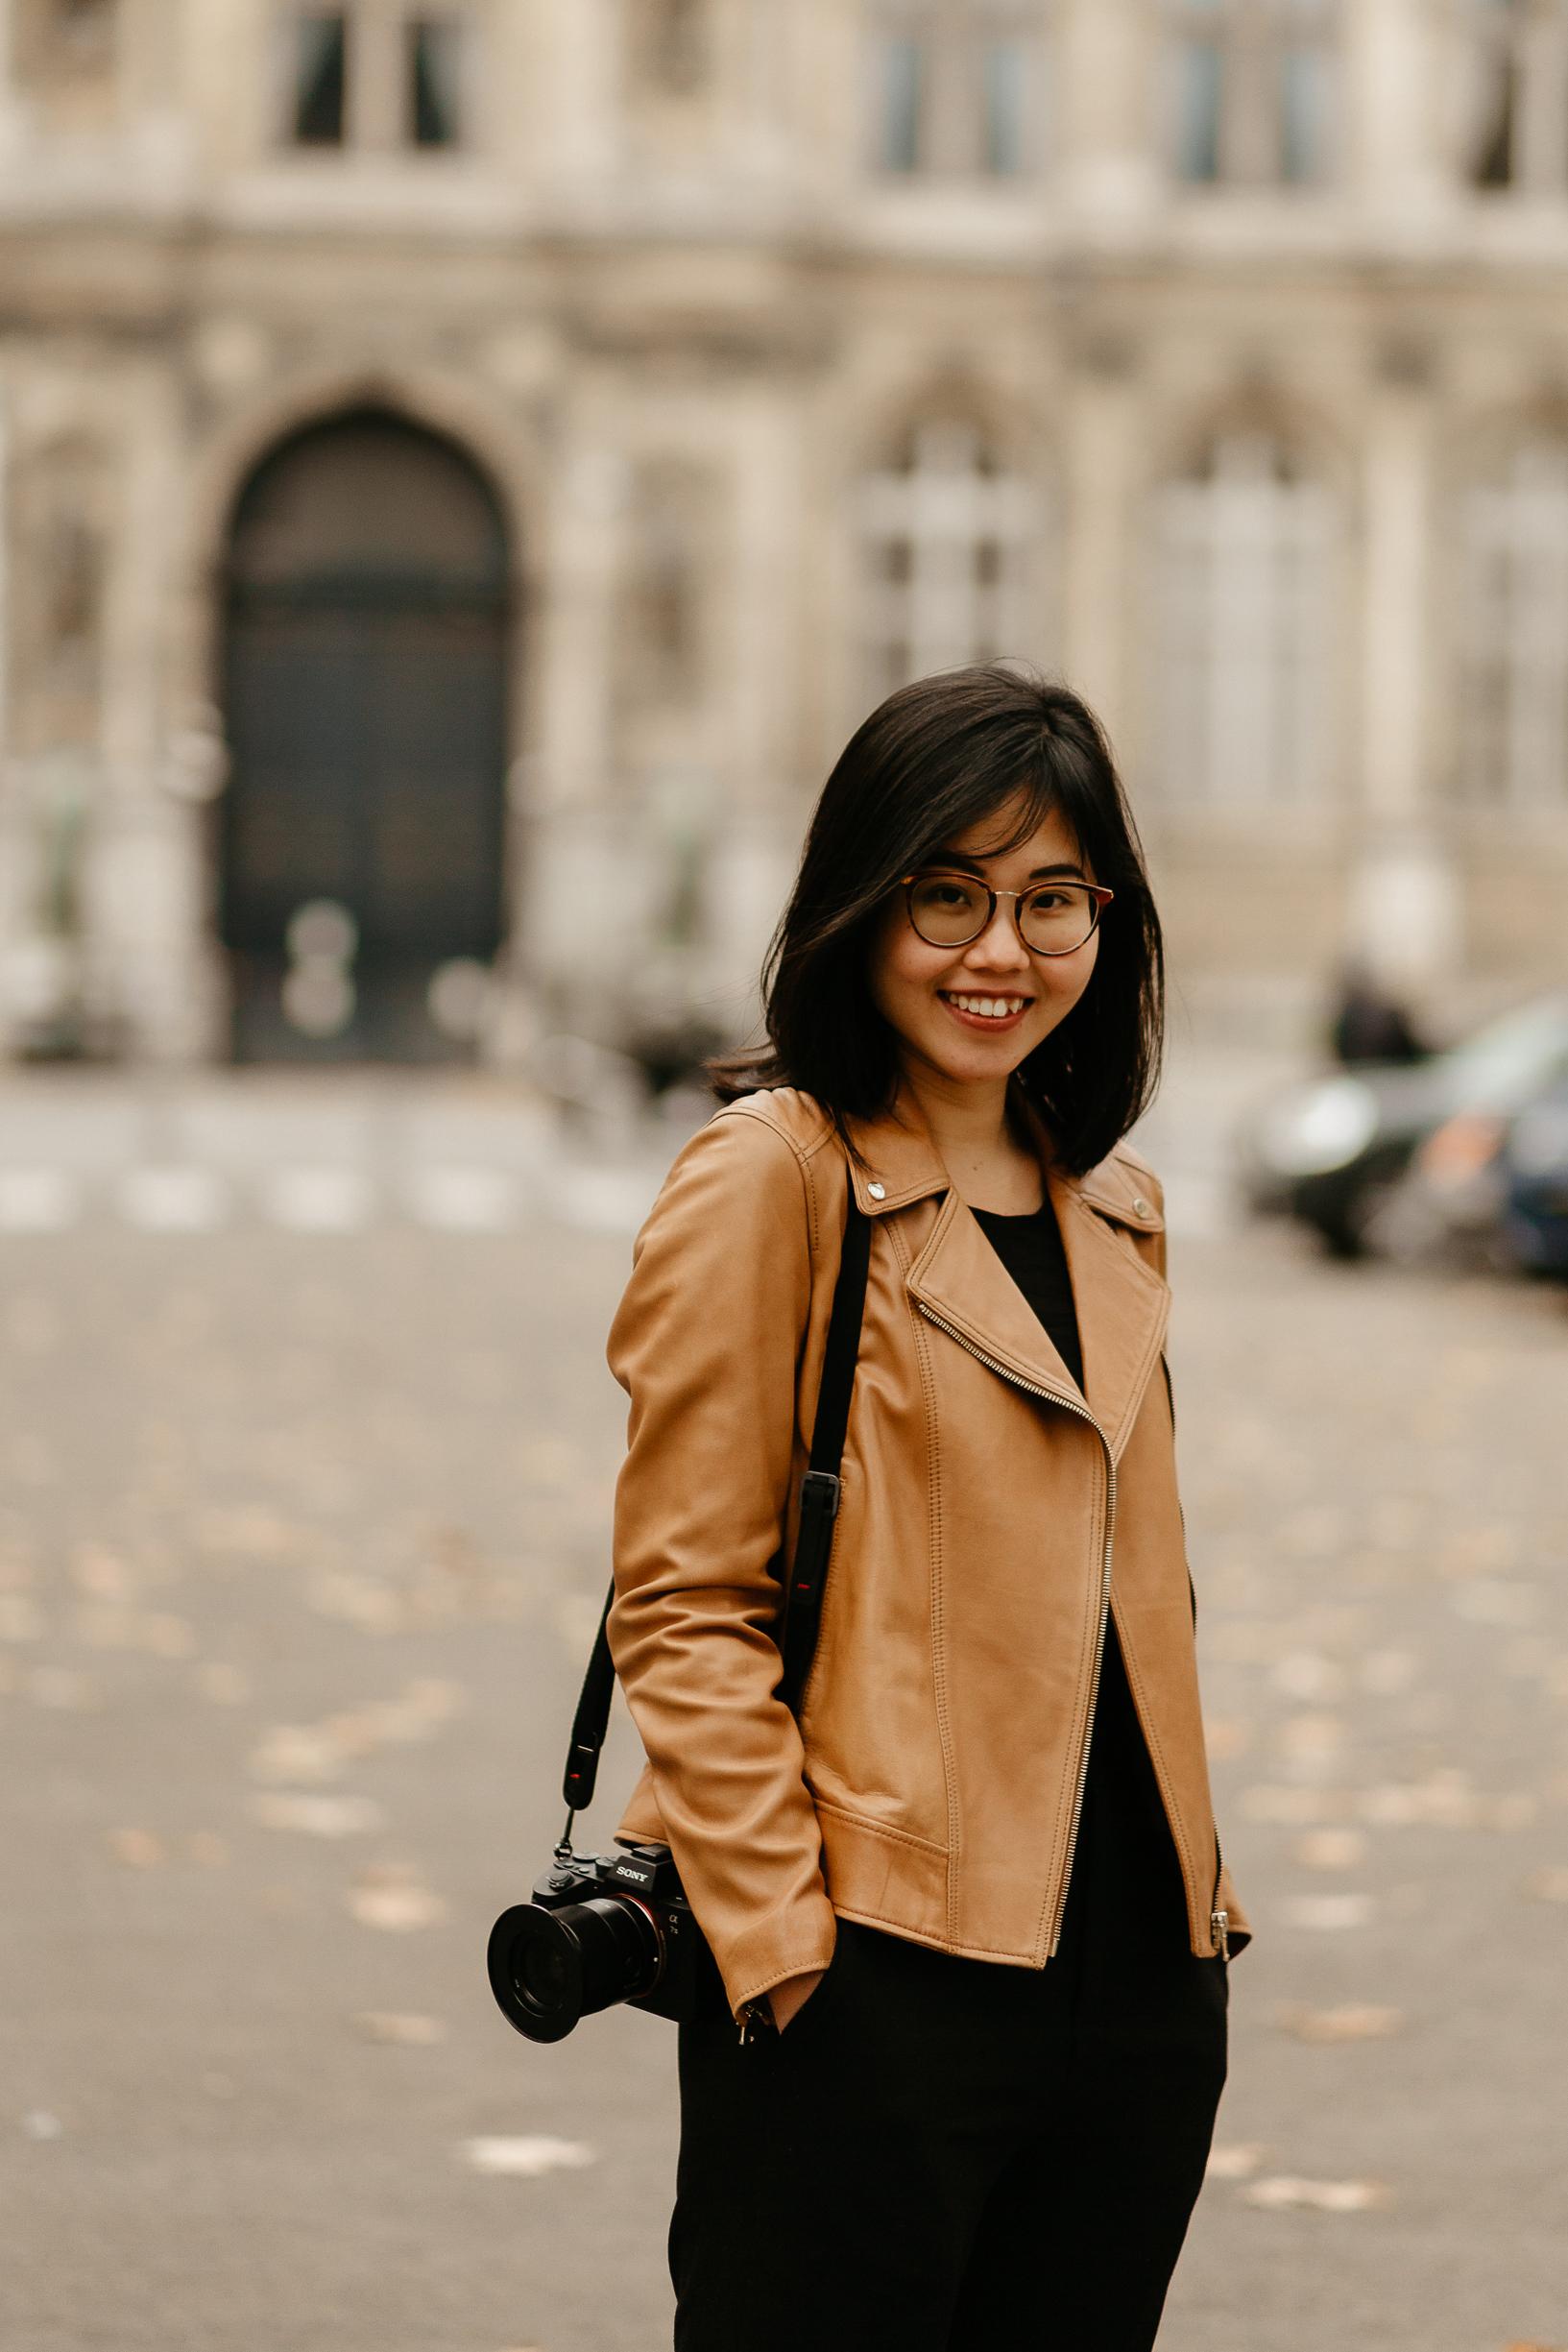 Paris Photographer Linh